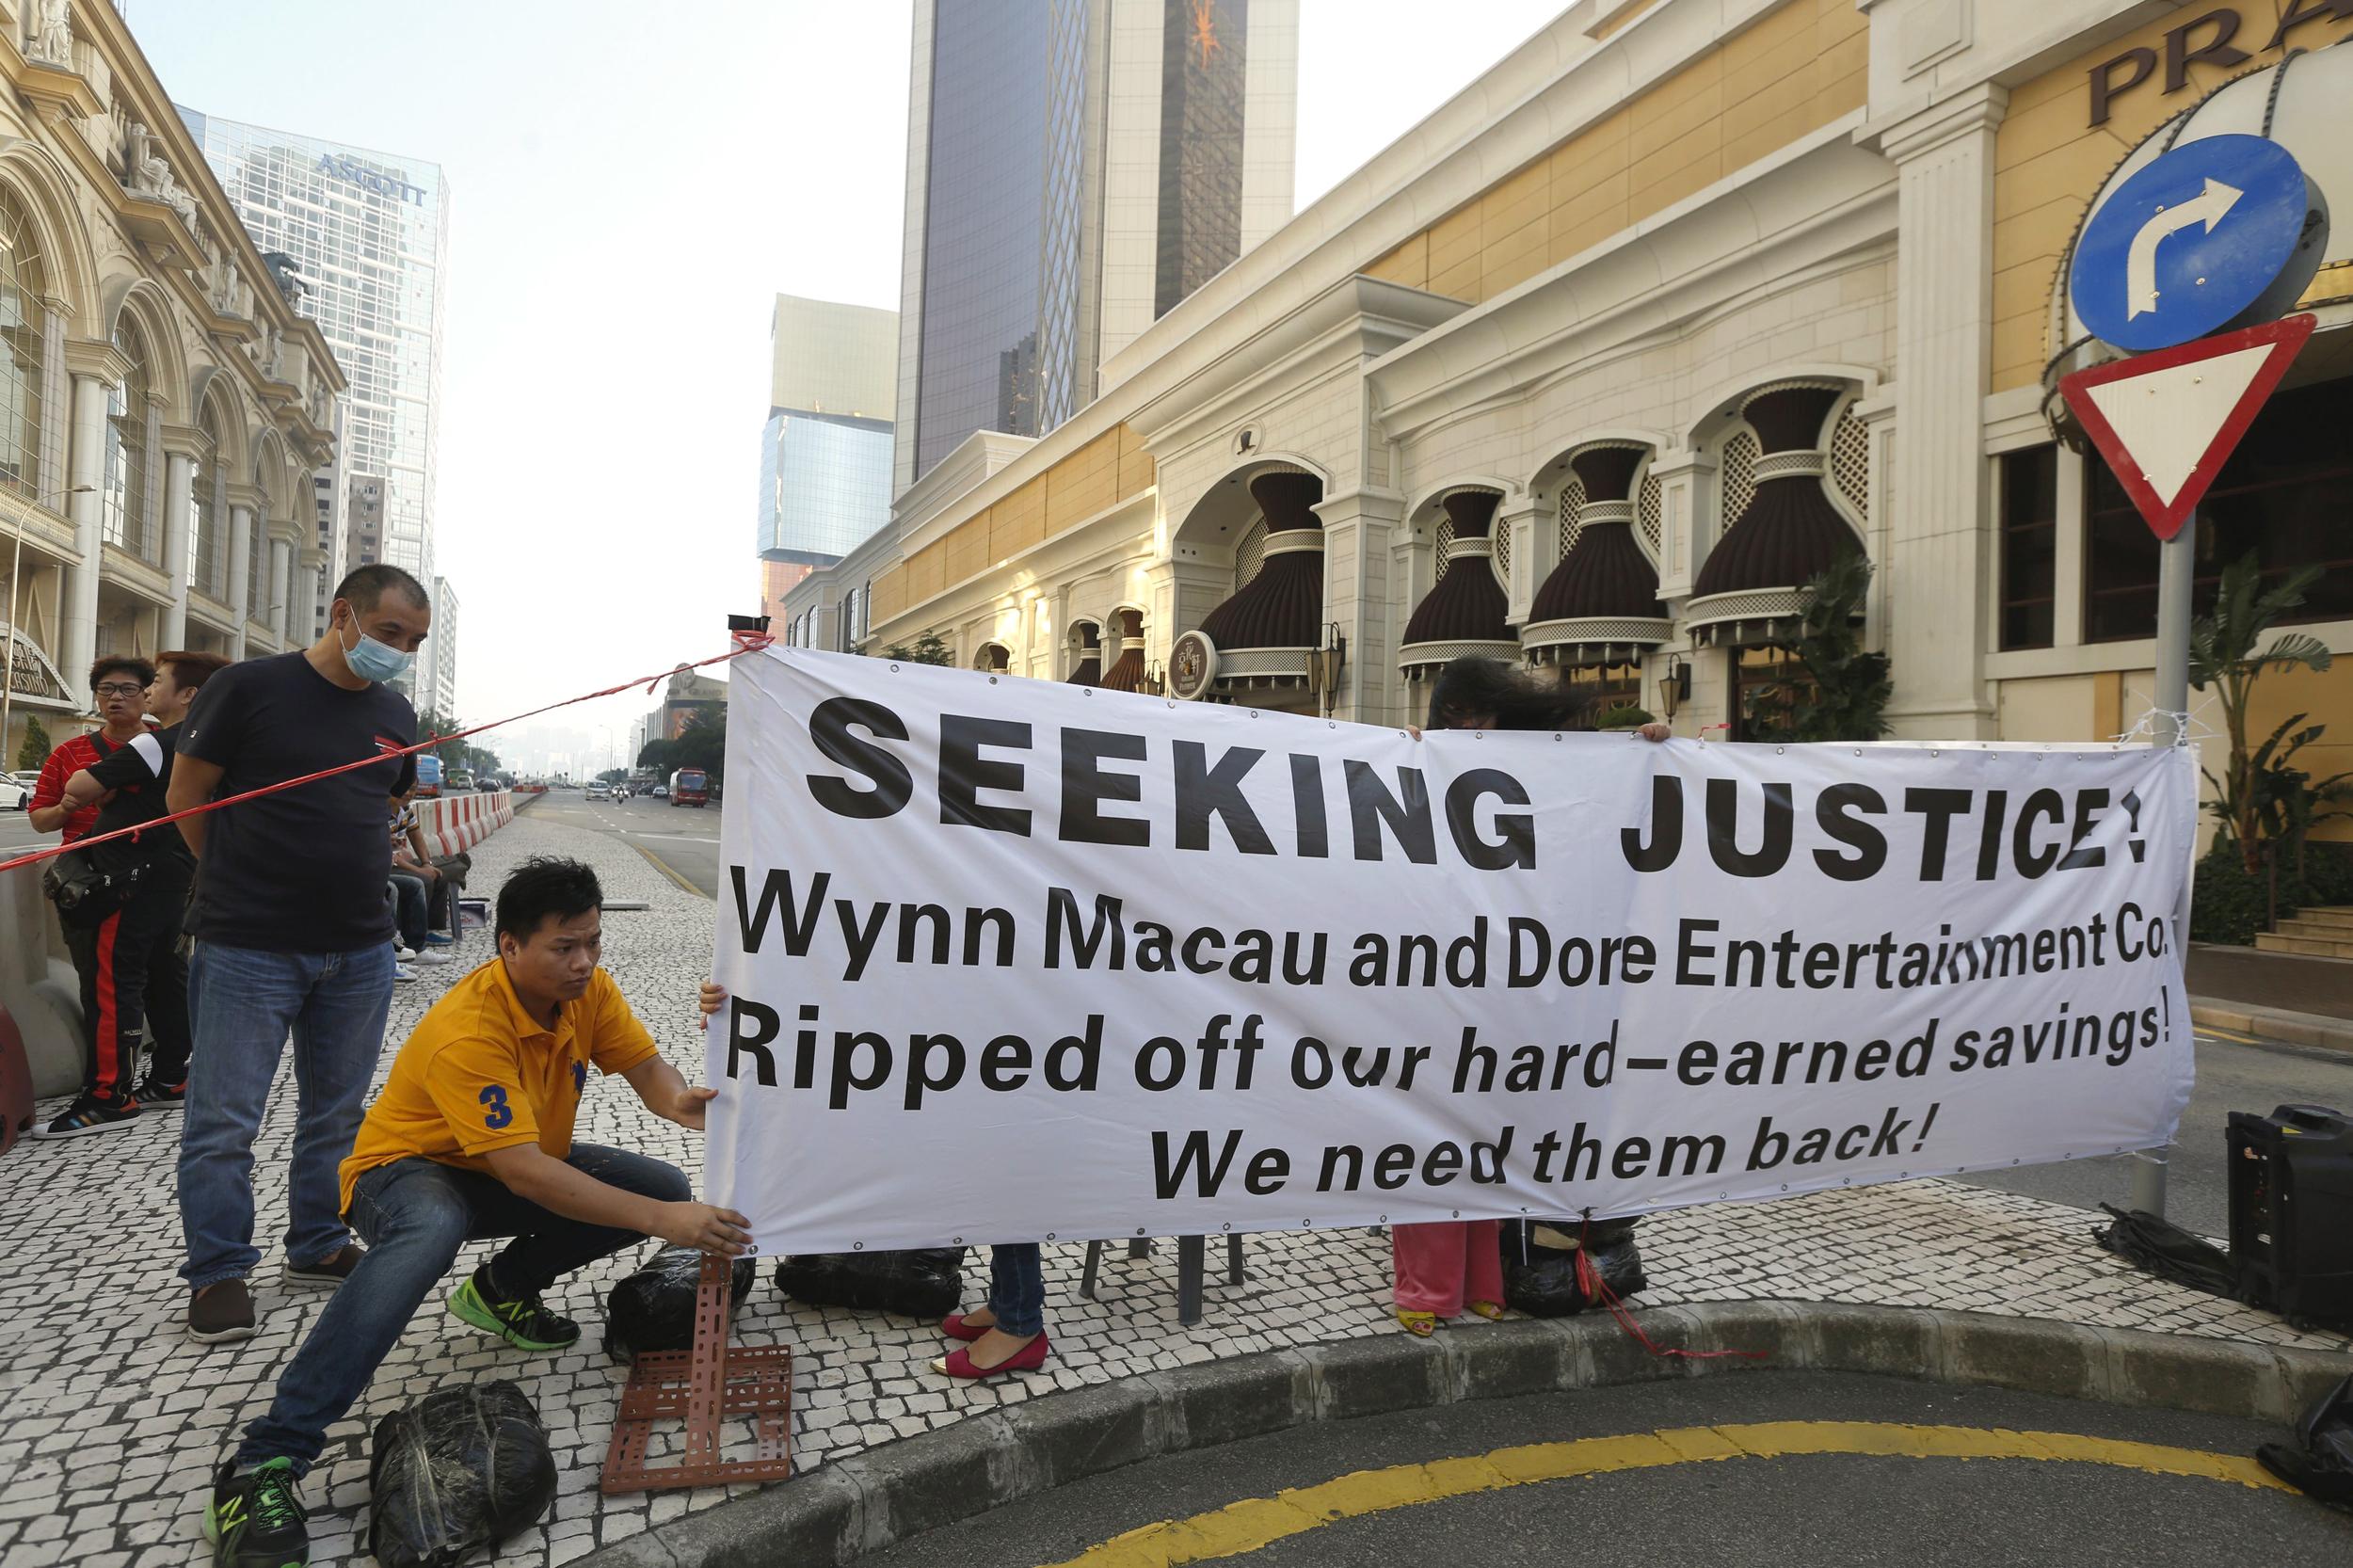 Macau's Gambling Business Rides Out Losing Streak